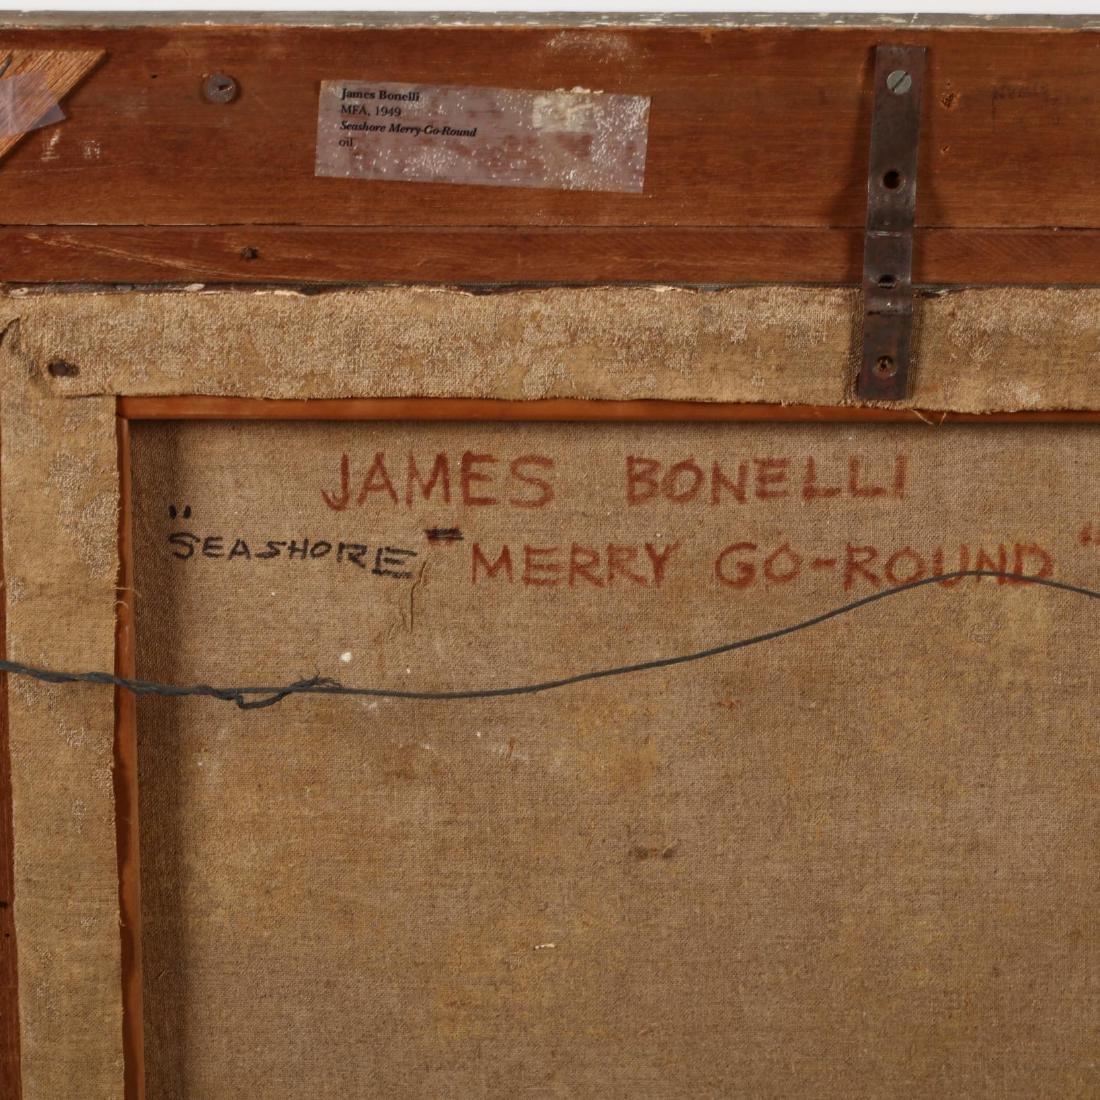 James Bonelli (PA, 1916-2000),  Seashore Merry-Go-Round - 4